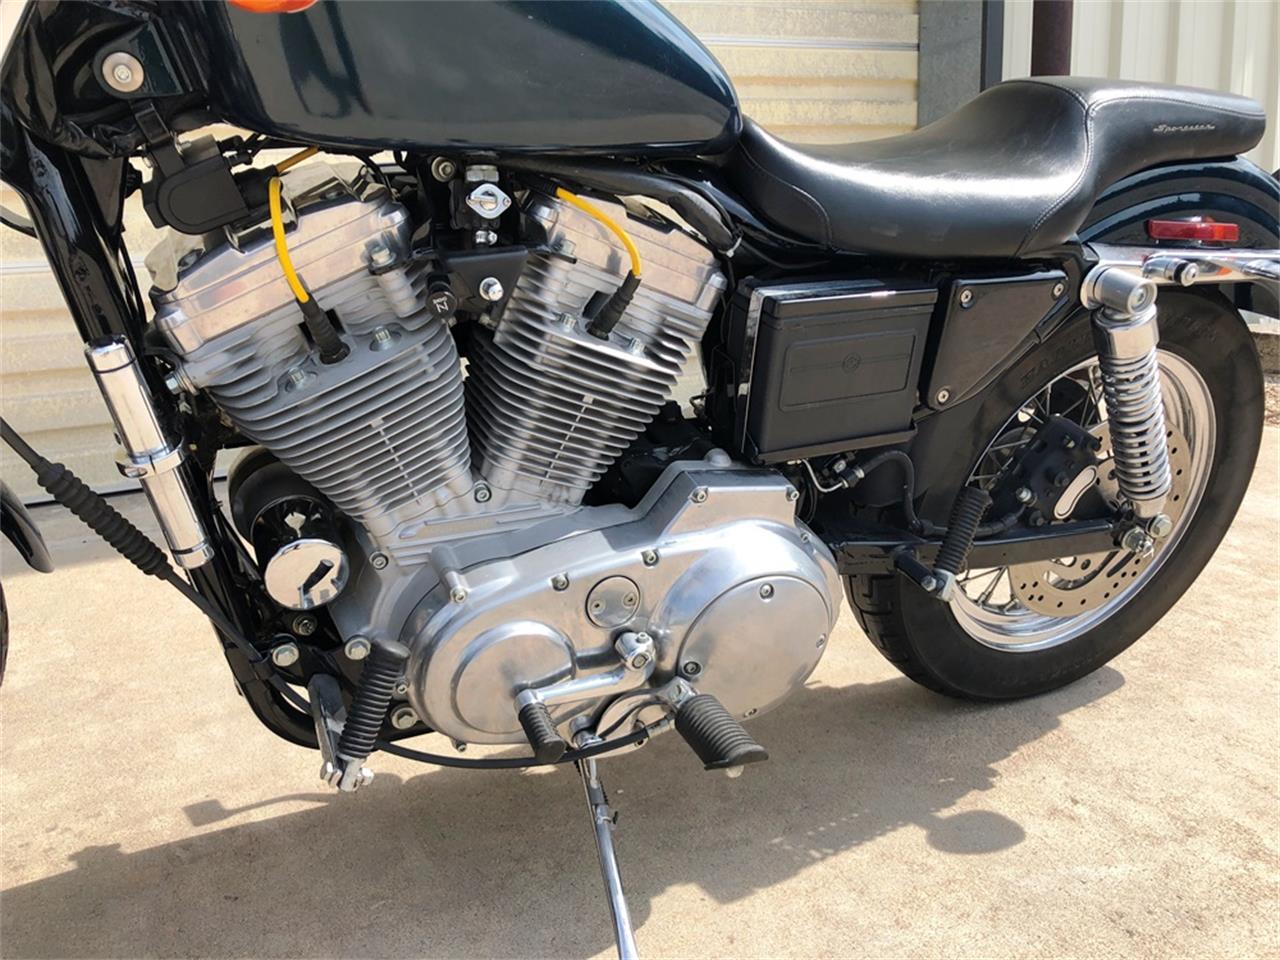 2001 Harley-Davidson Sportster (CC-1262150) for sale in Great Bend, Kansas